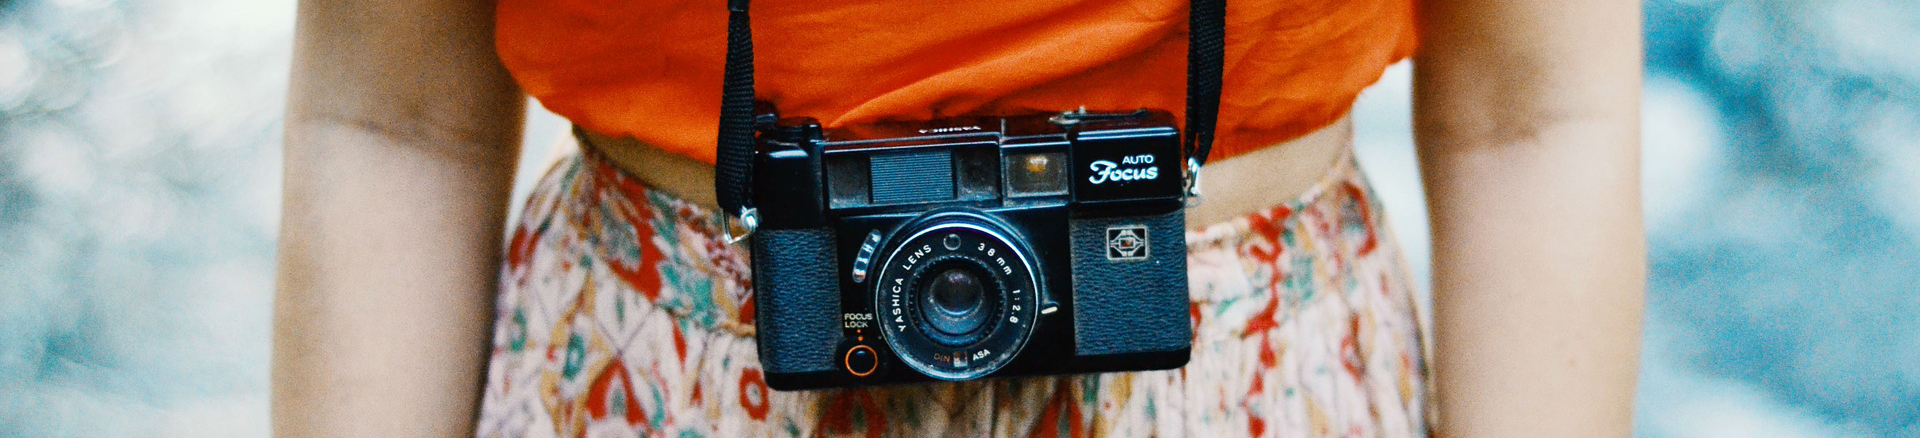 camera-1846476_1920